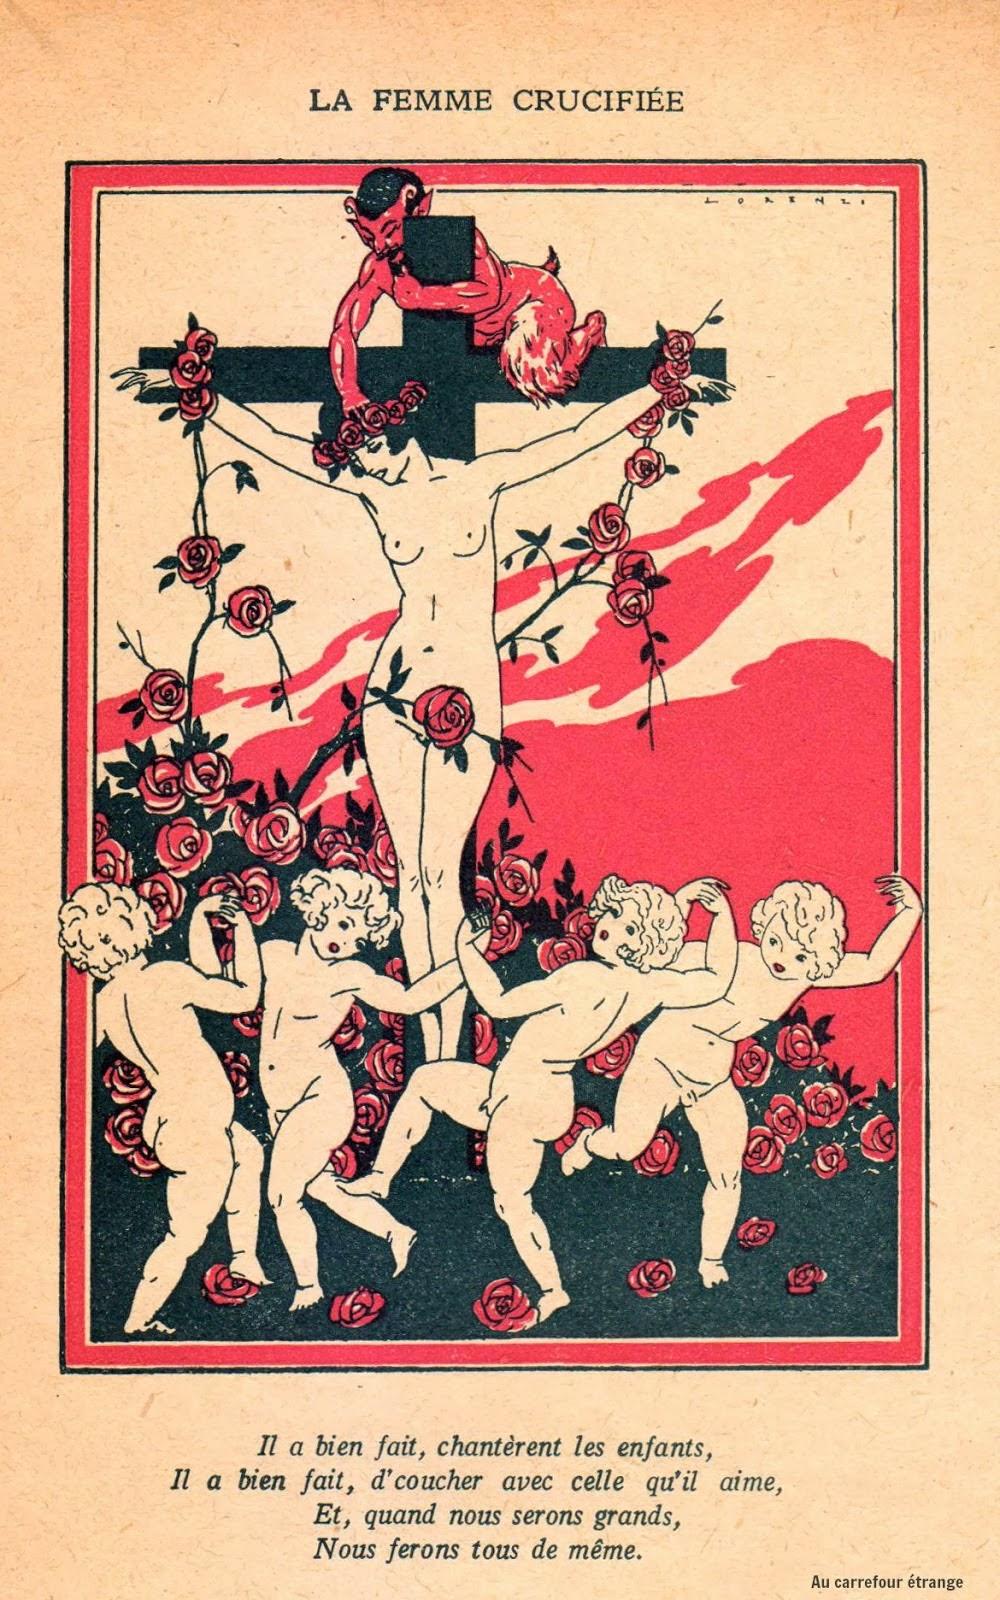 Mujeres crucificadas Crucified women  Fabio Lorenzi